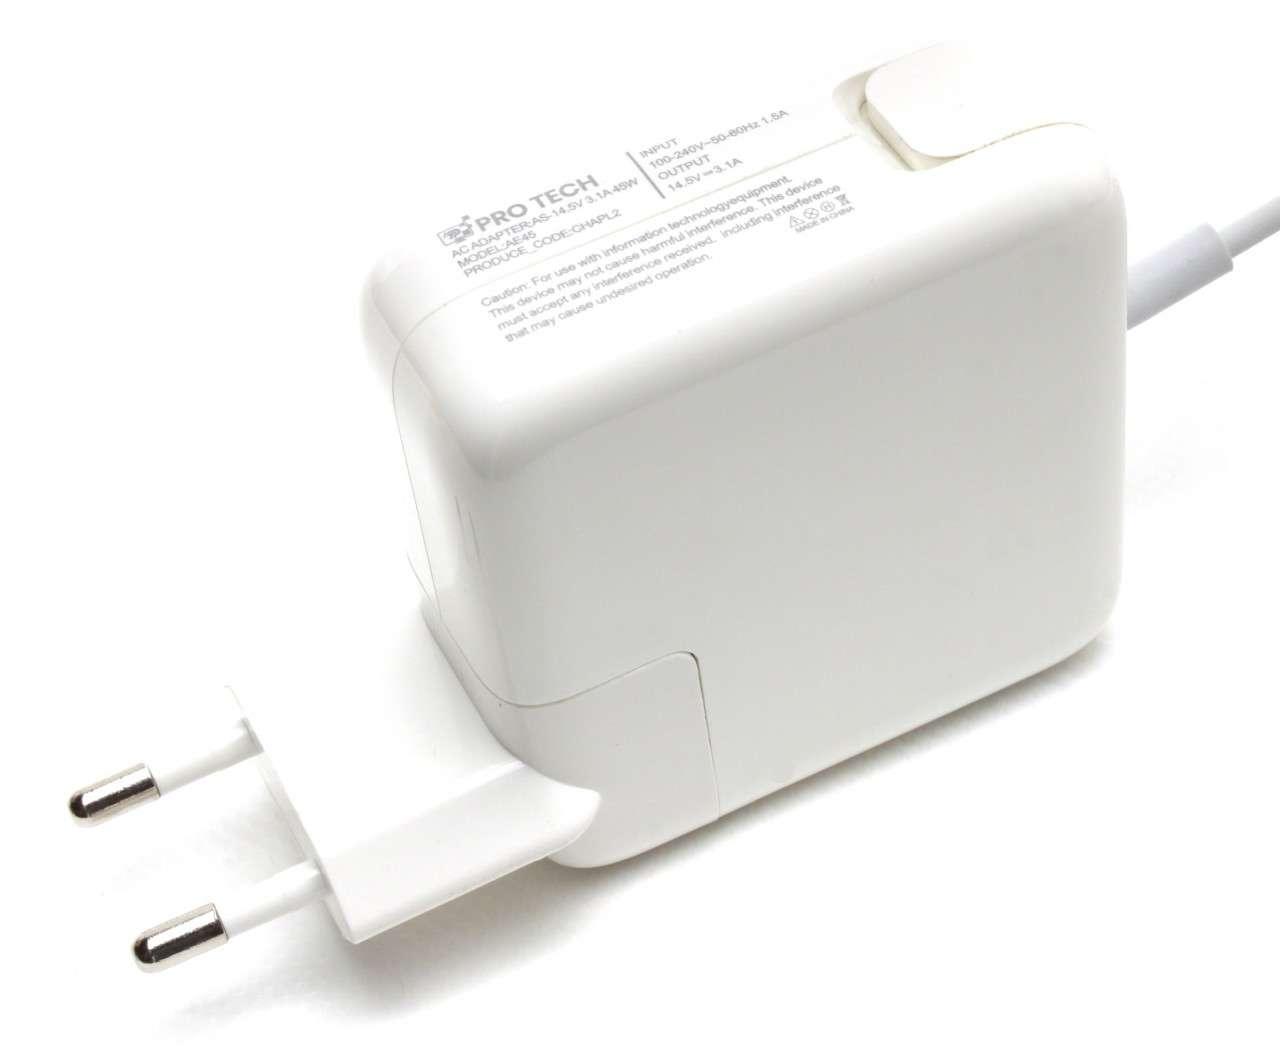 Incarcator Apple MacBook Air A1370 45W Replacement imagine powerlaptop.ro 2021